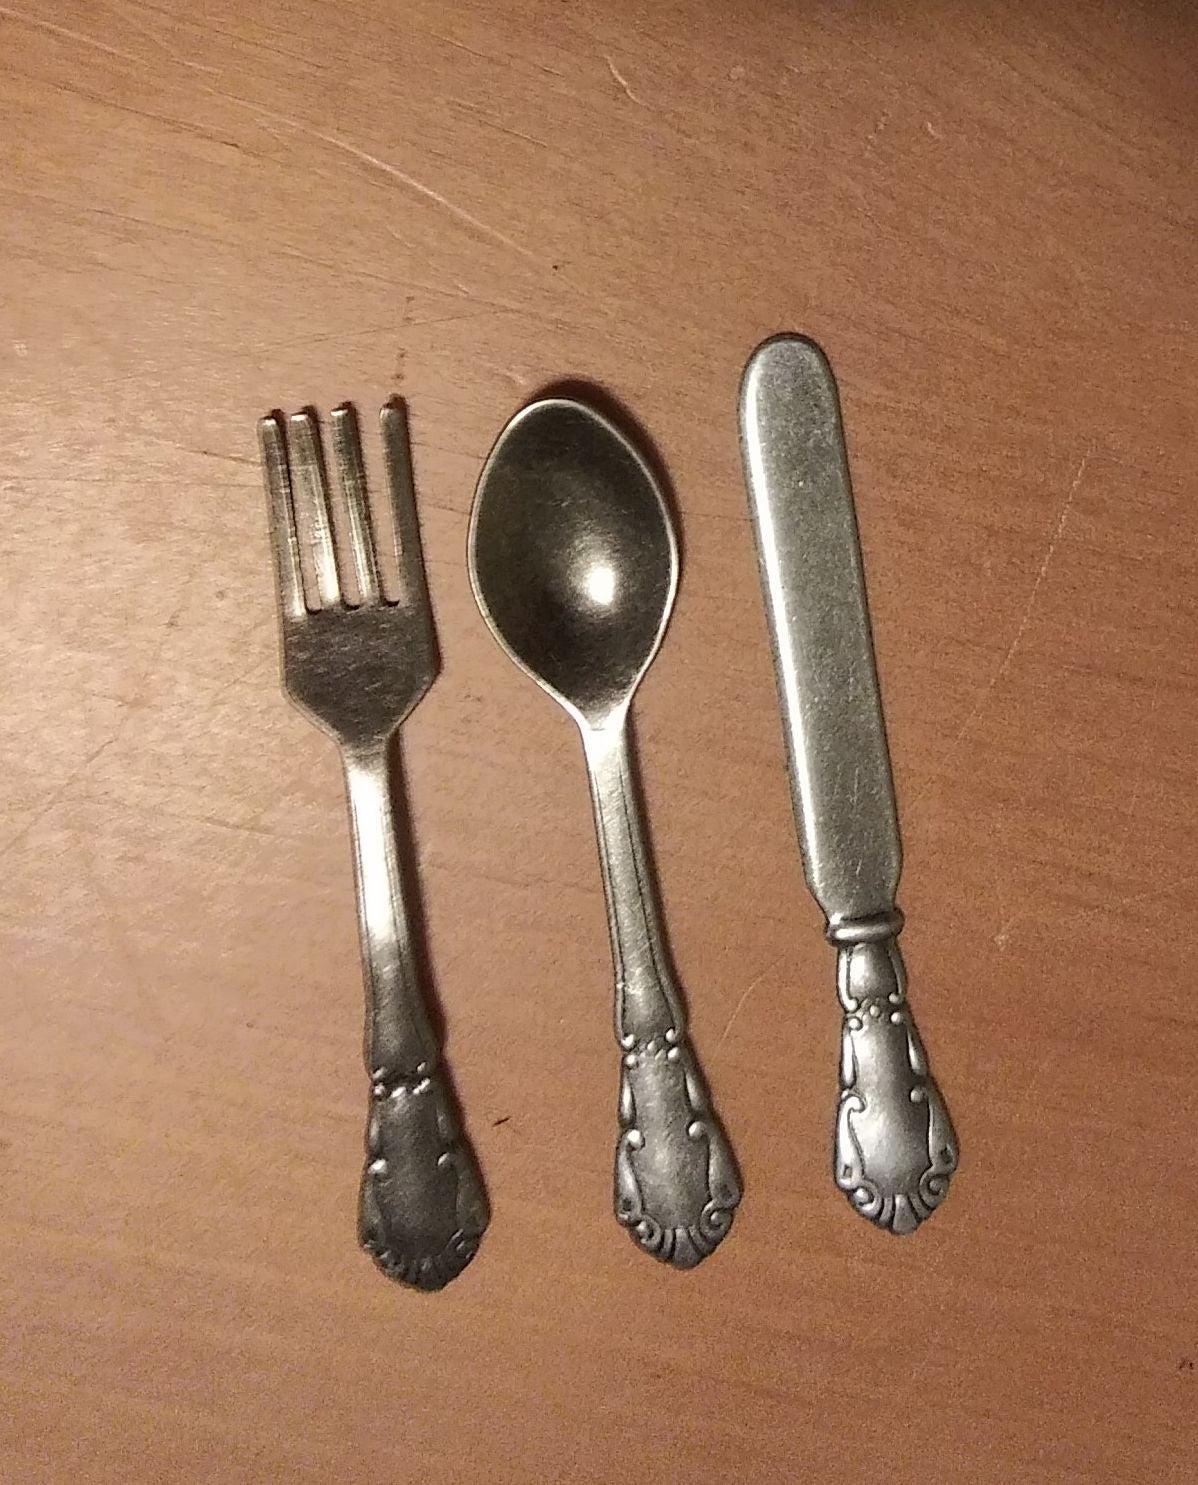 Miniature fork, spoon & butter knife